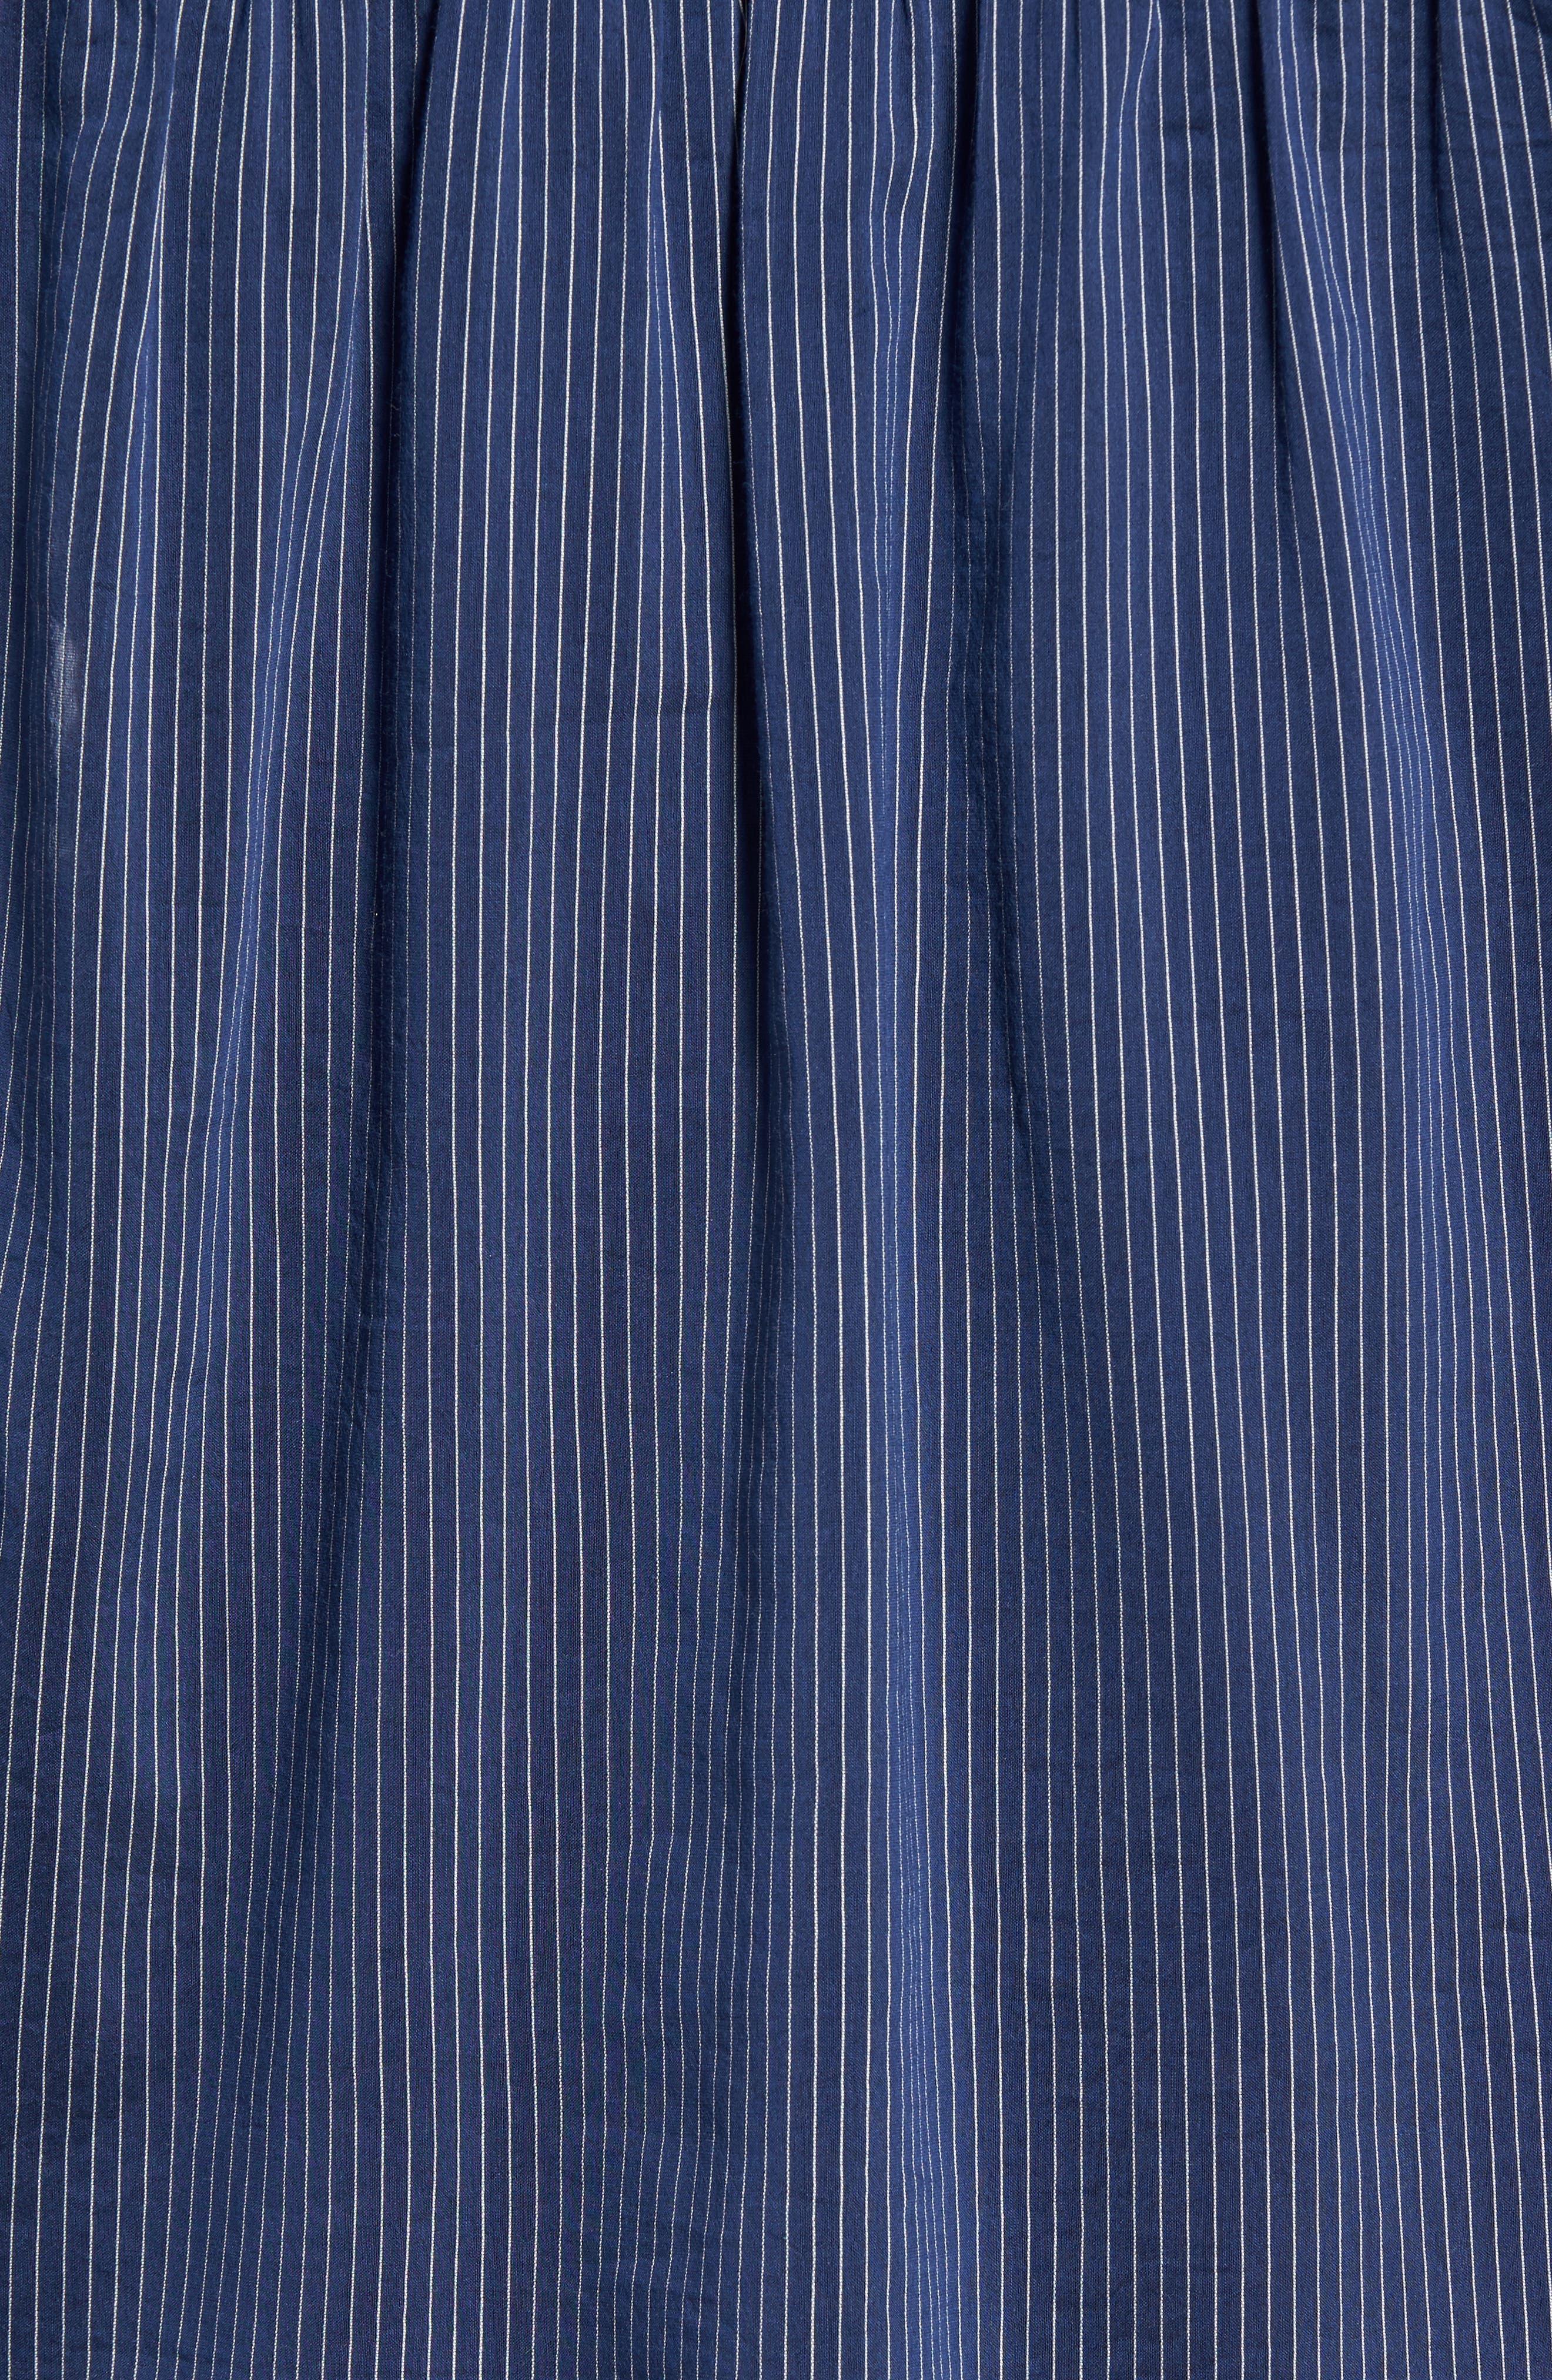 Stripe Cotton & Silk Top,                             Alternate thumbnail 5, color,                             410